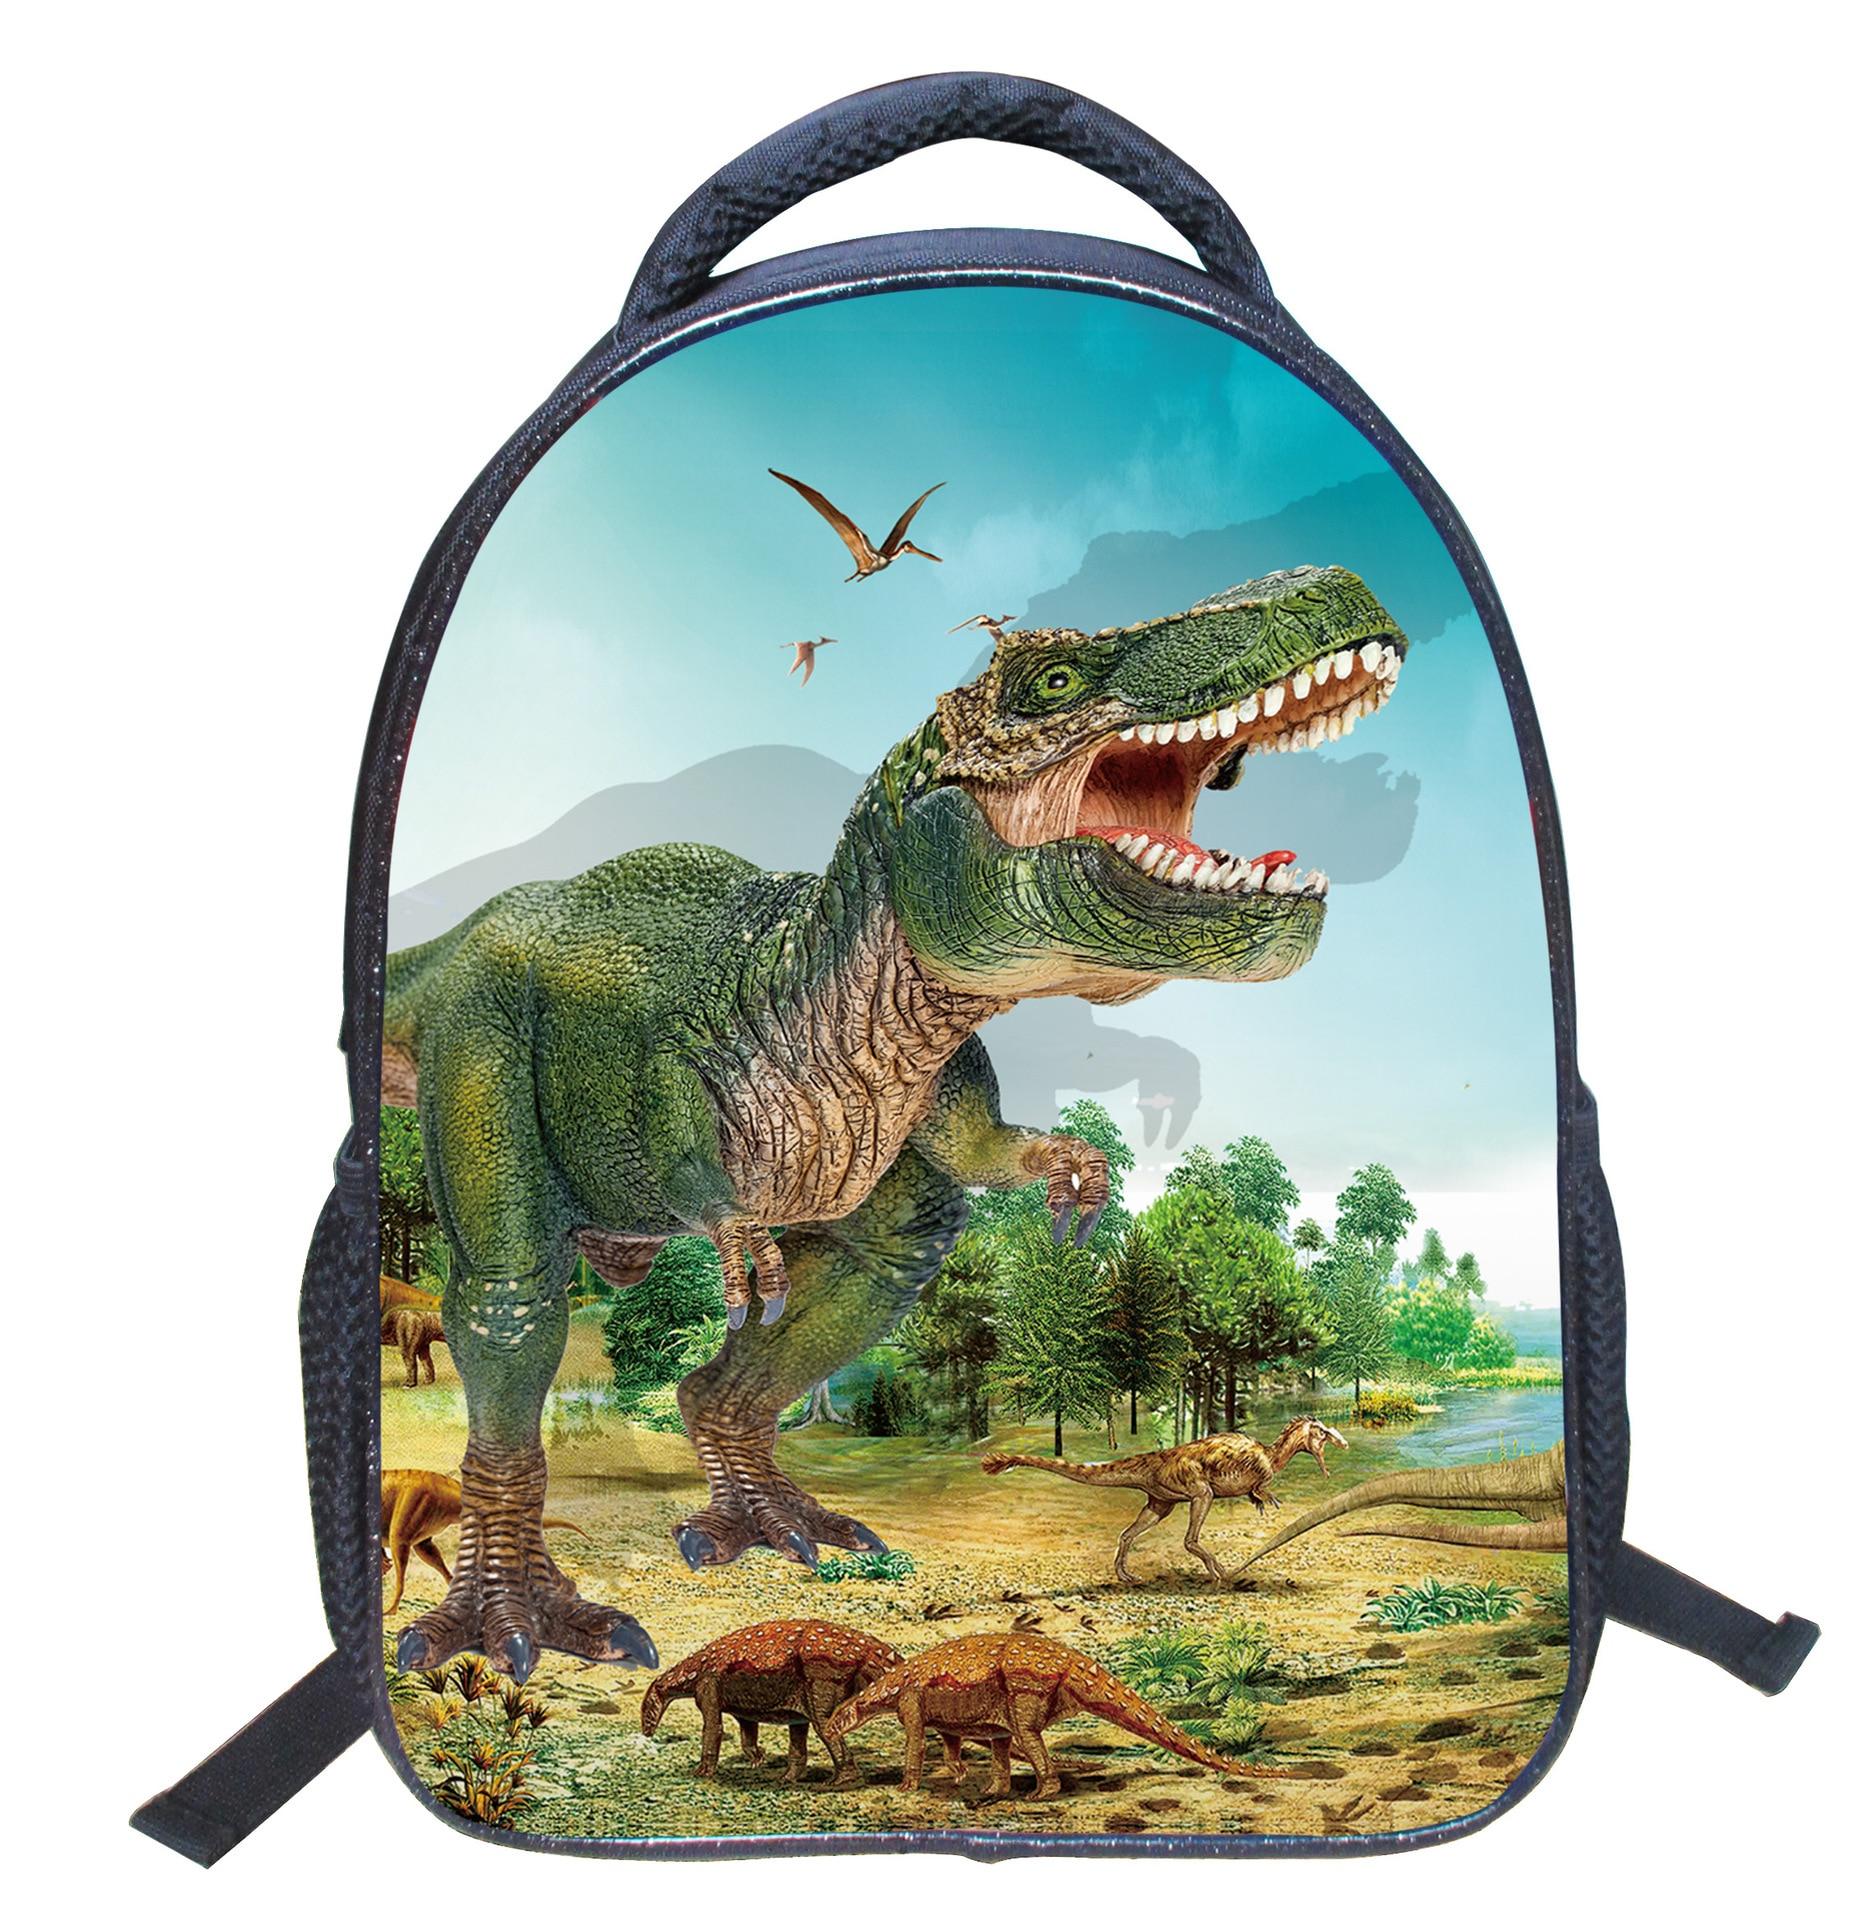 Boys 3D Dinosaur Cartoon School Bags For Girls 2017 Kids Bag Children Backpacks Kindergarten Book Bag Schoolbags Mochila Escolar chiaro паула 4 411011605